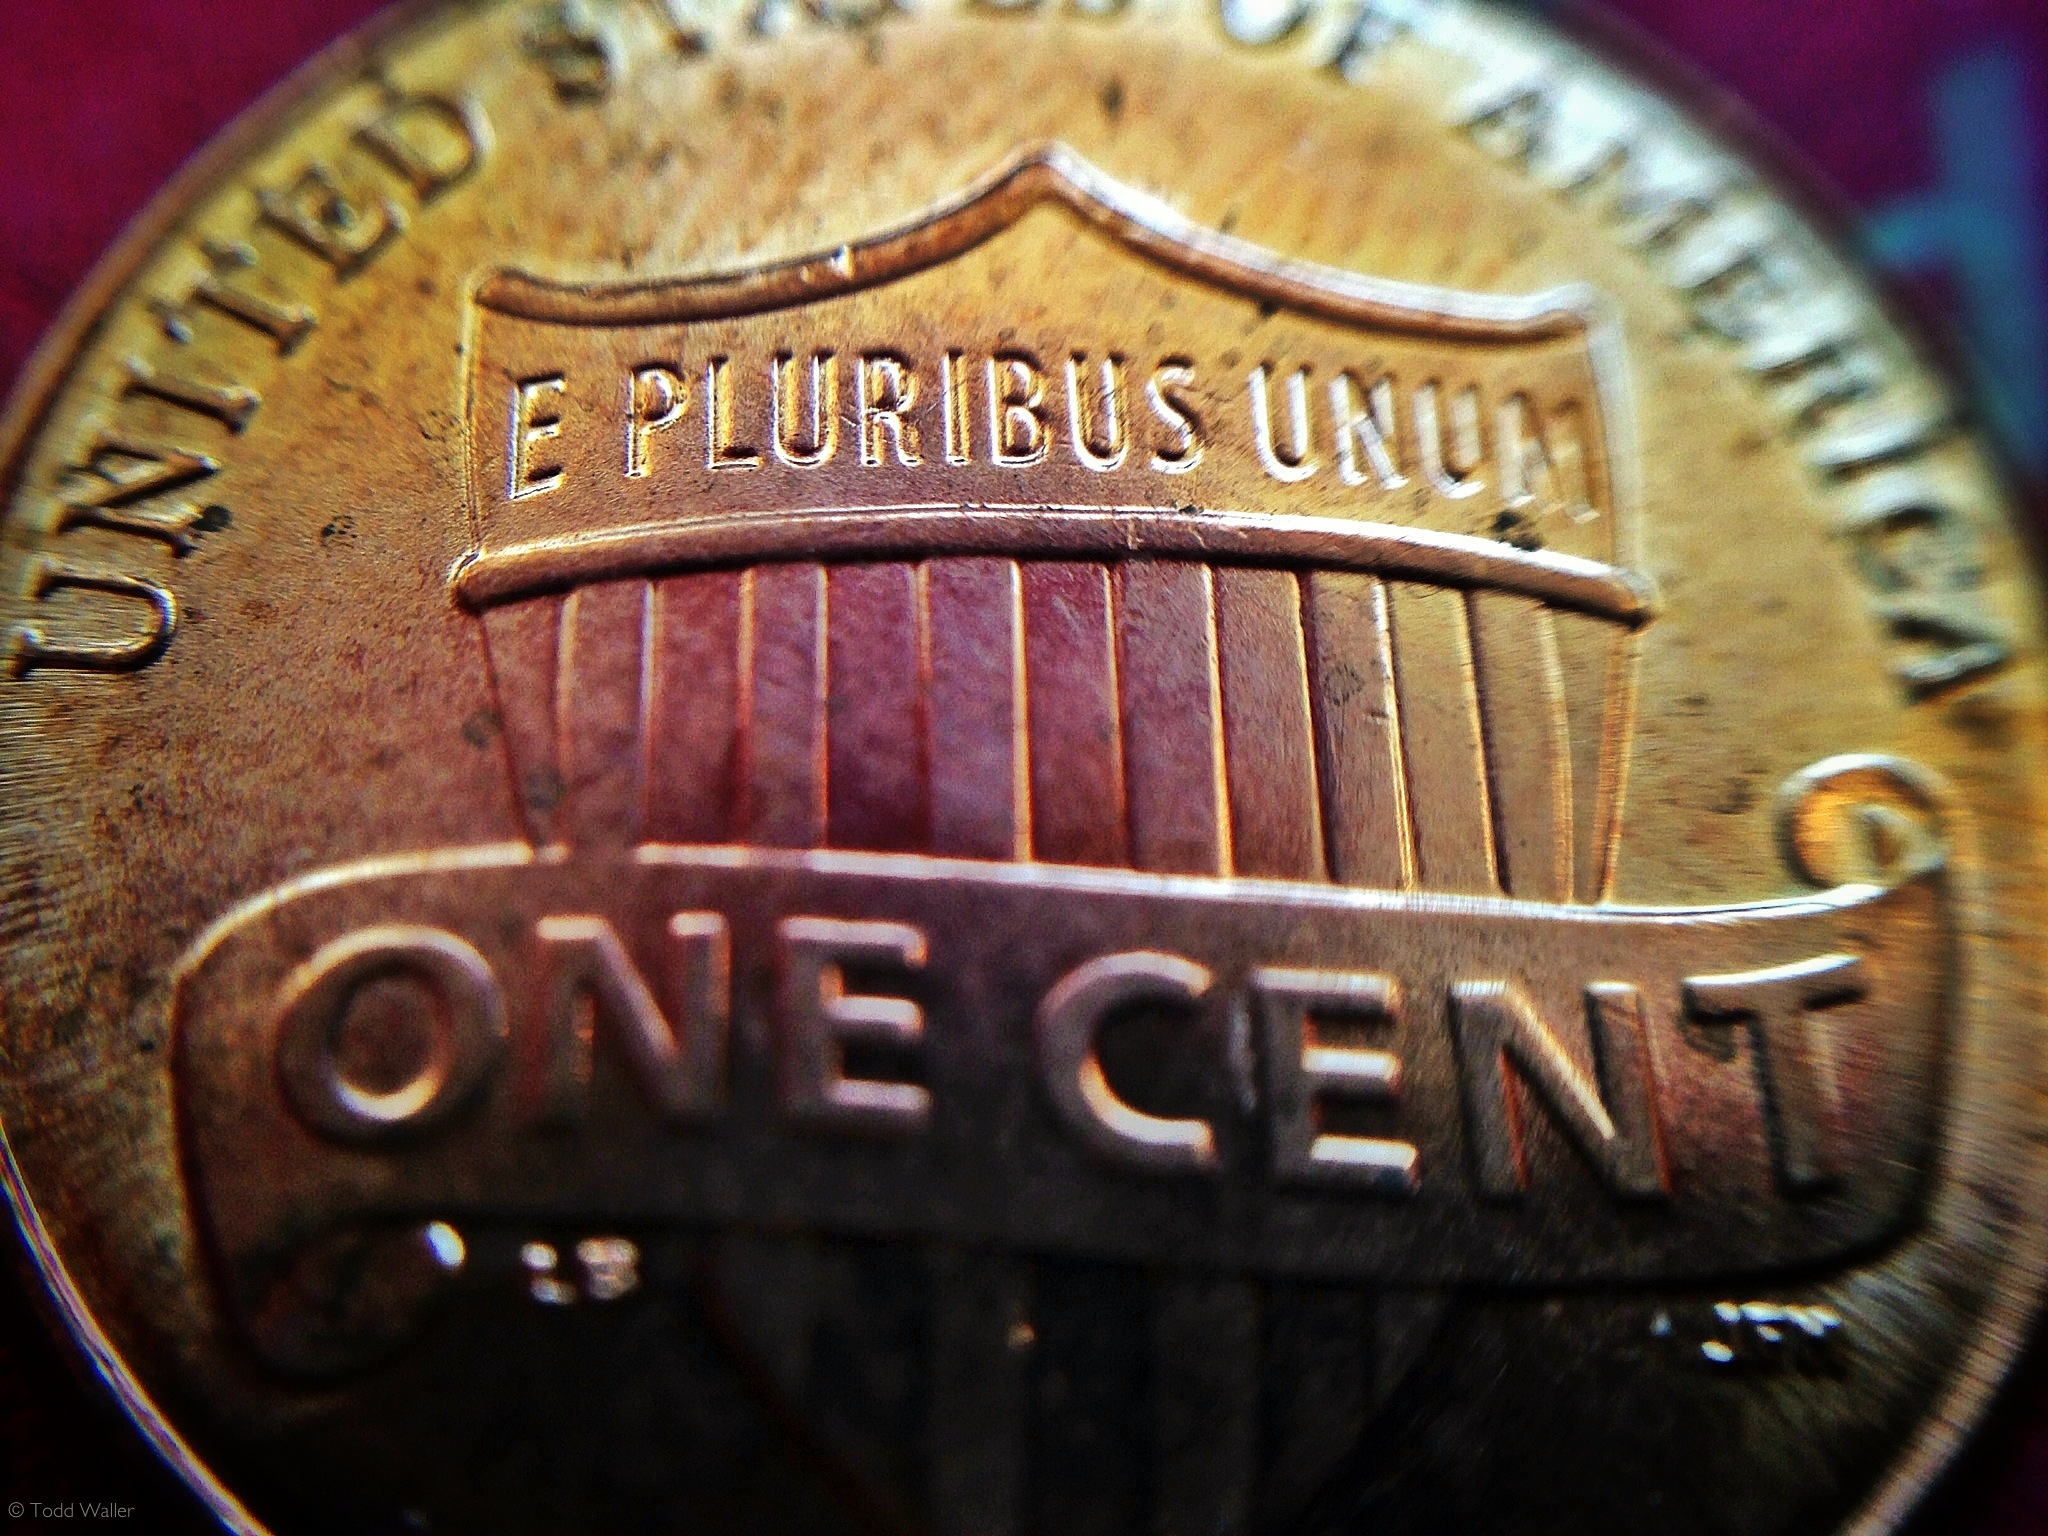 Common Cent